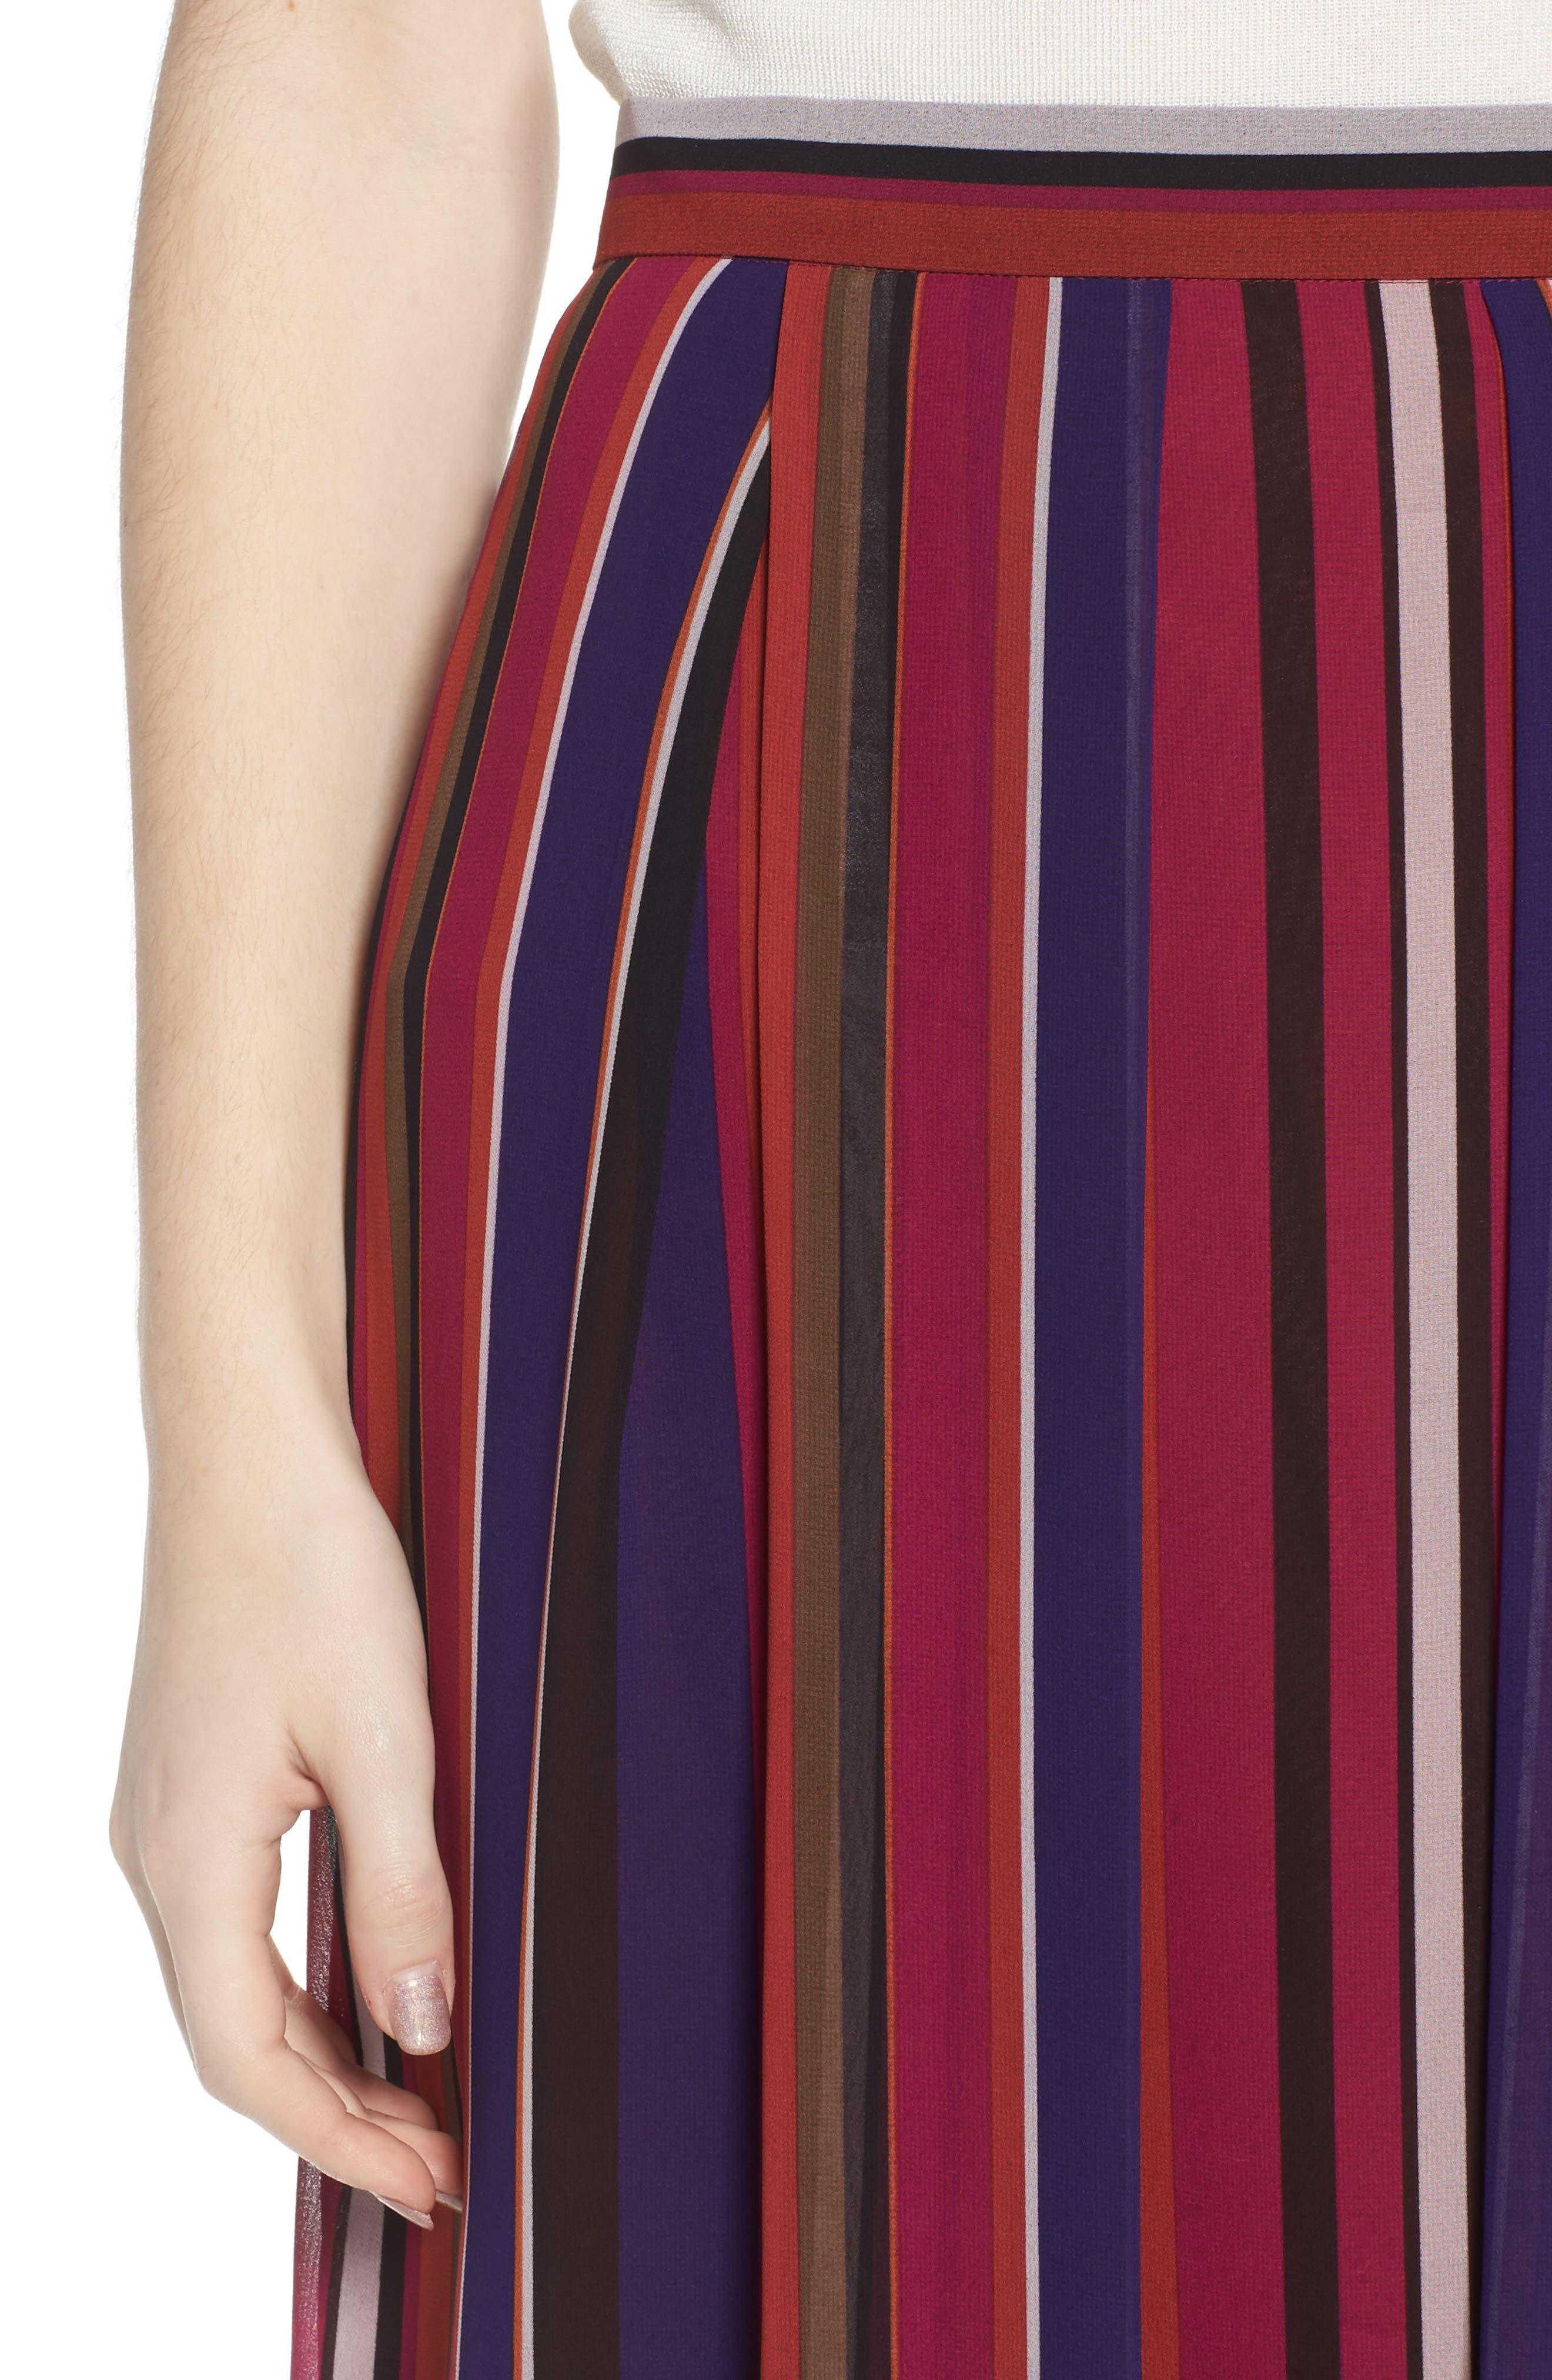 Striped Midi Skirt,                             Alternate thumbnail 4, color,